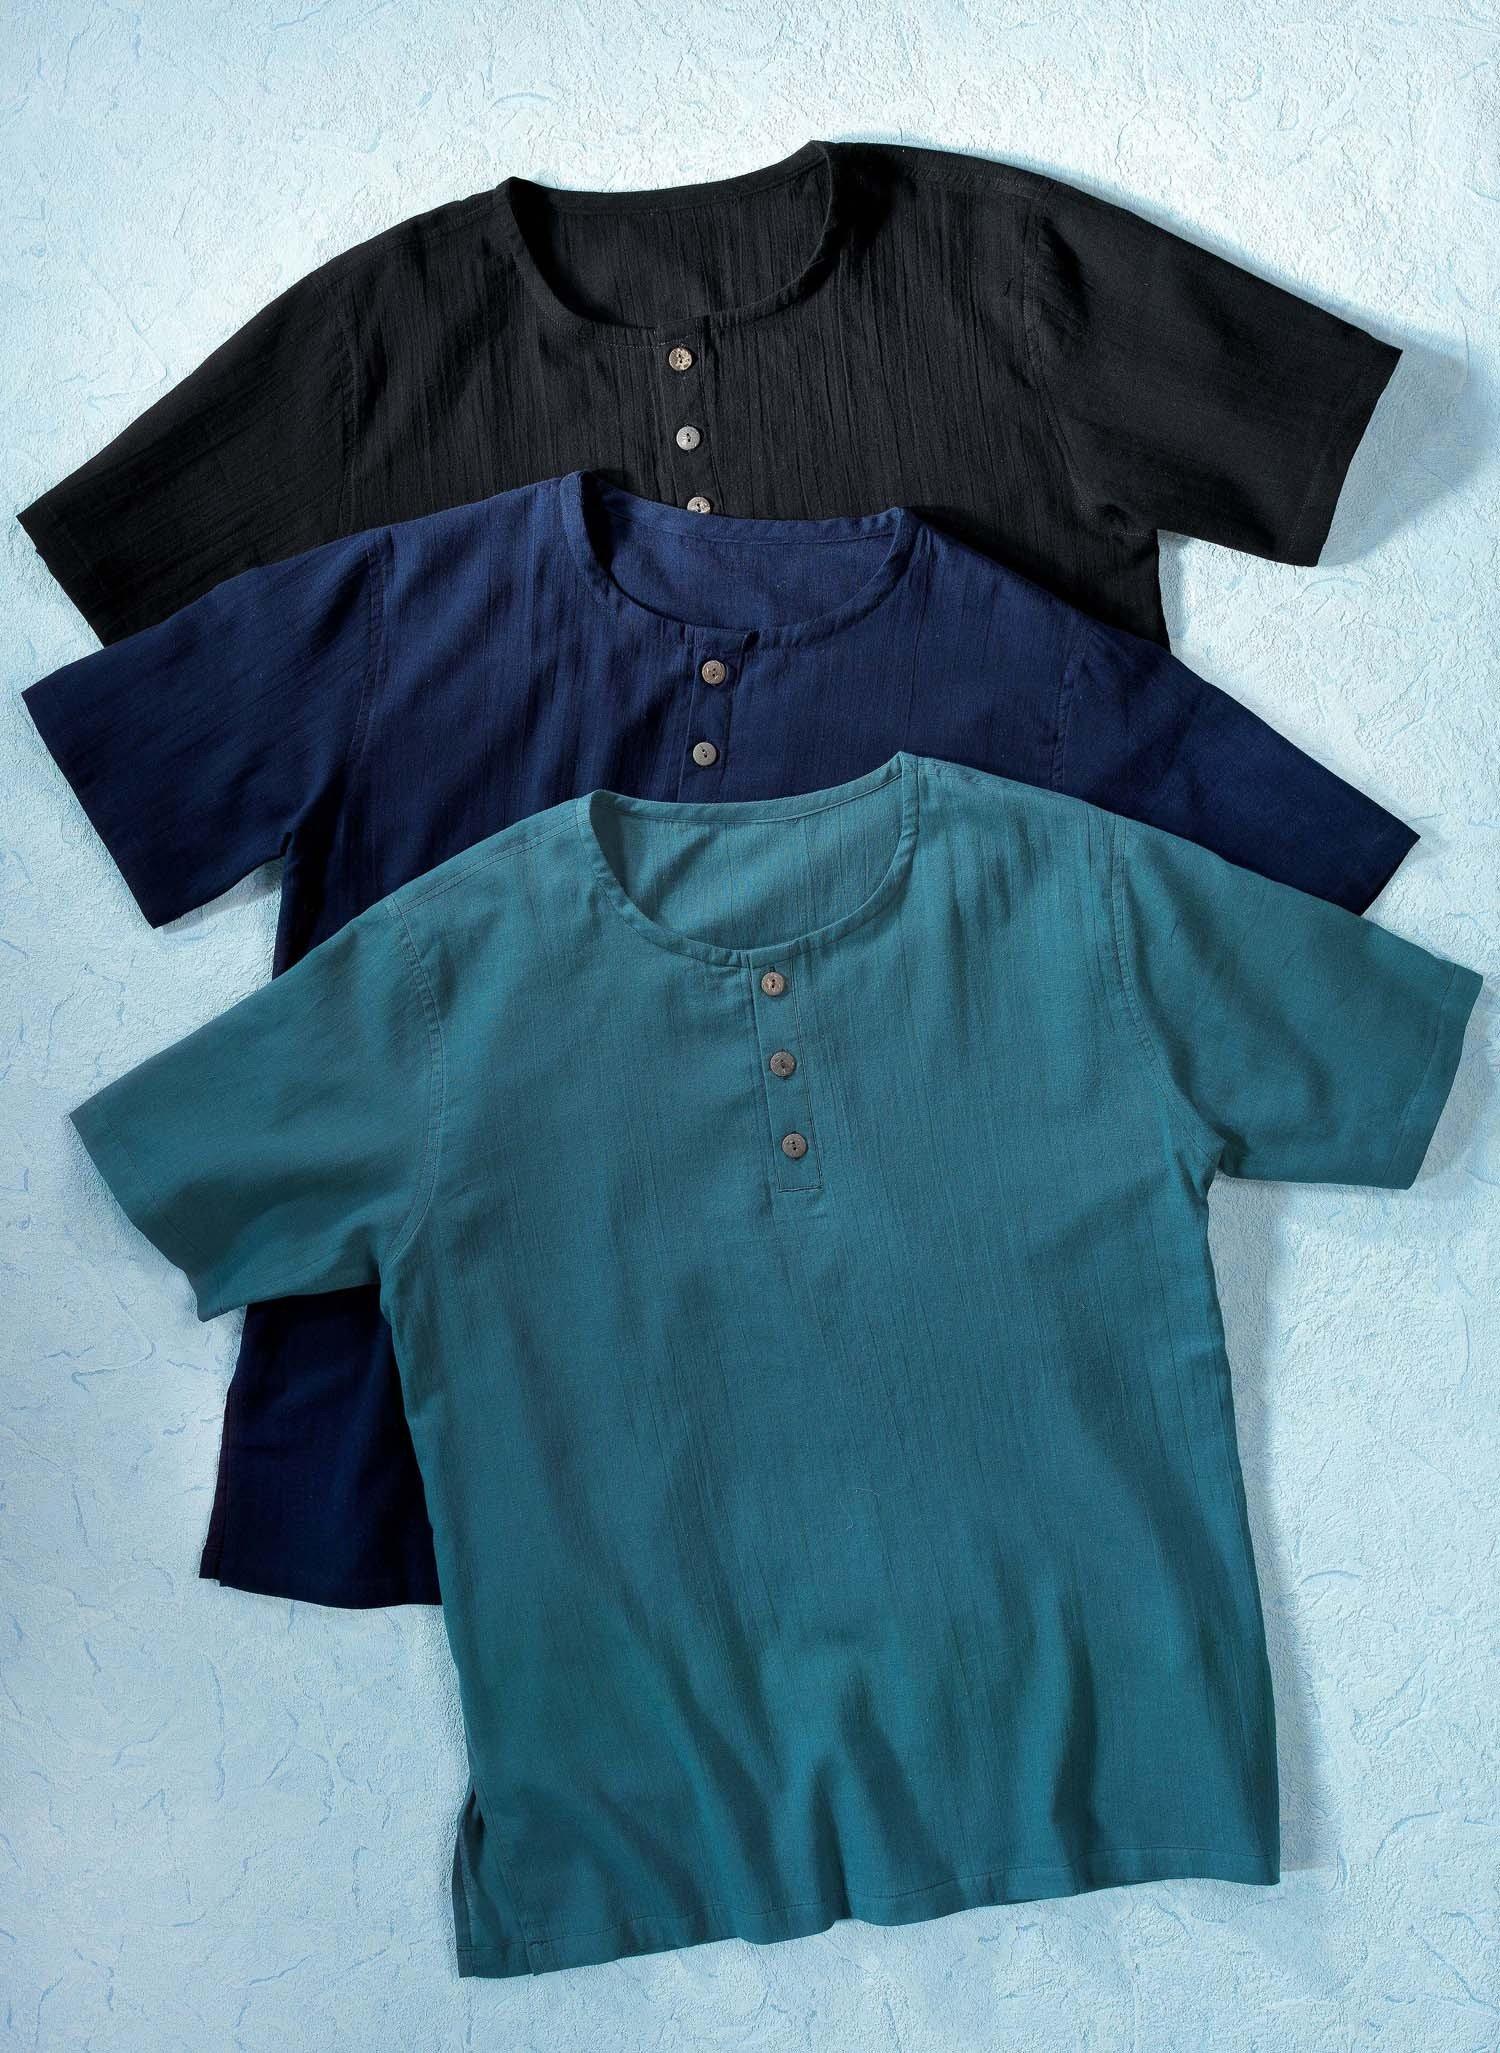 H-KA-Shirt-Hemd,Knöpfe schwarz L 010 - 2 - Ronja.ch